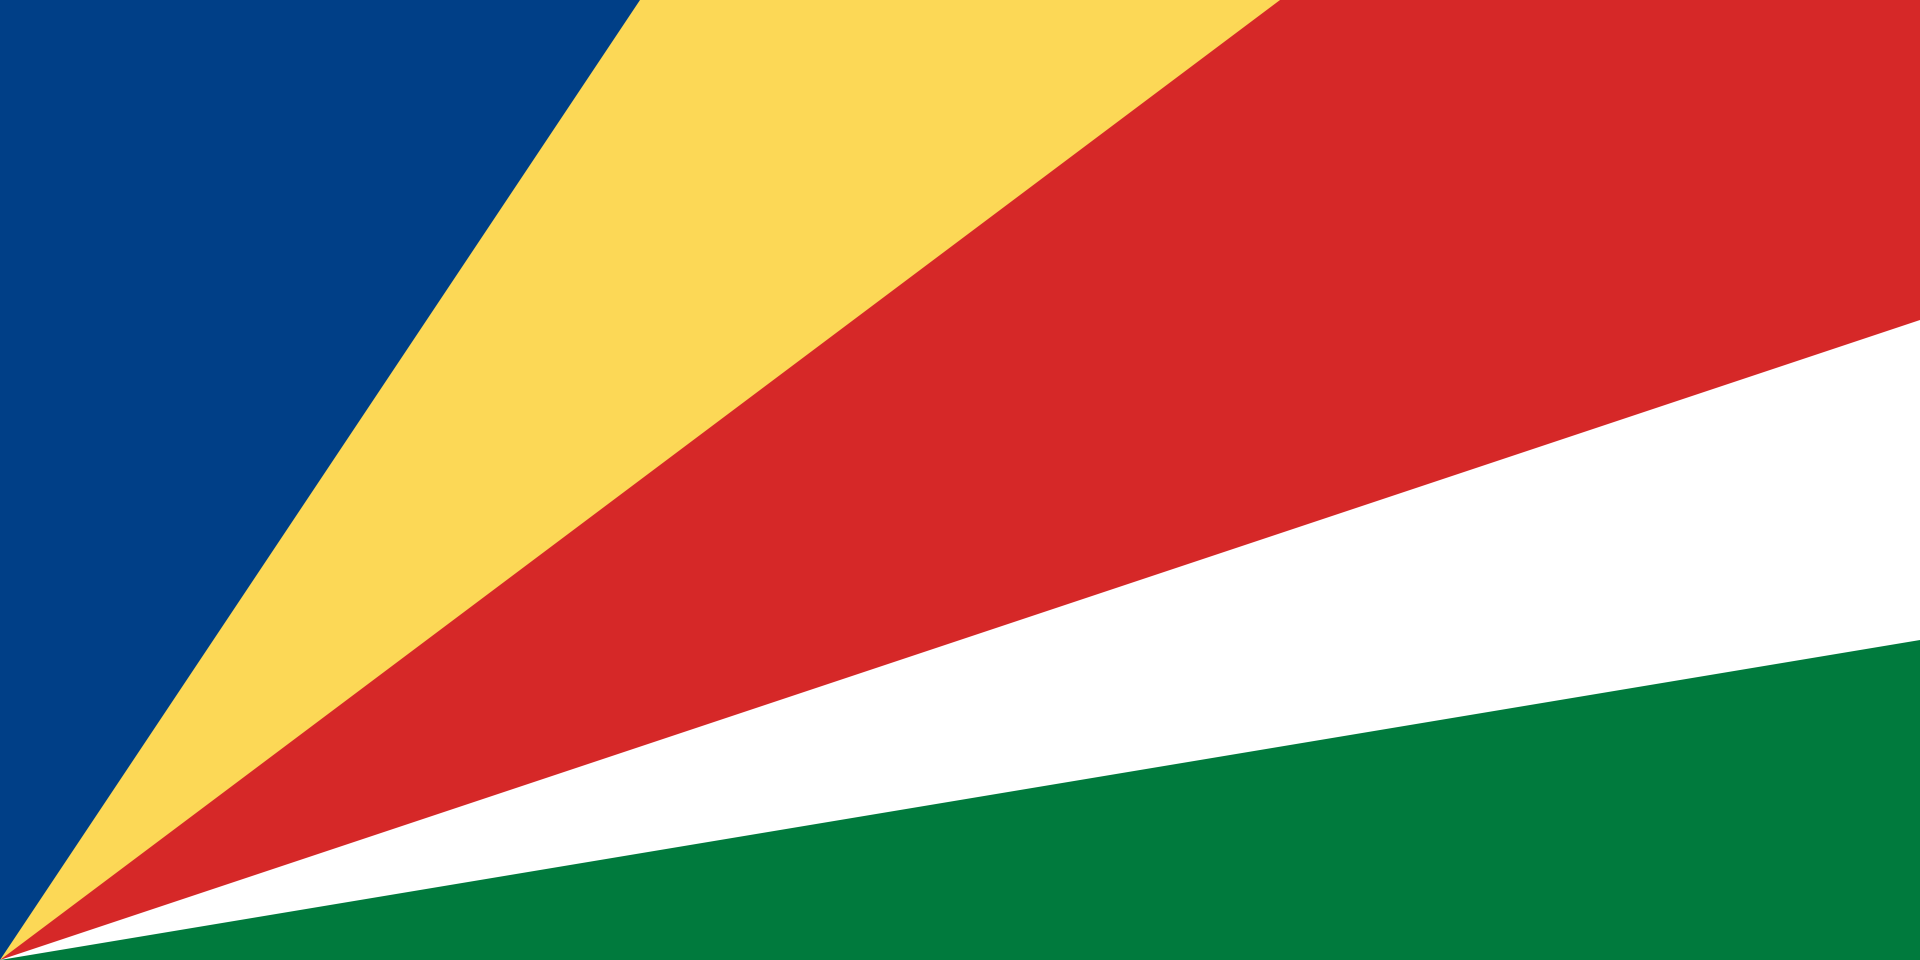 Chemical-Free Seychelles Pool Dealer Flag